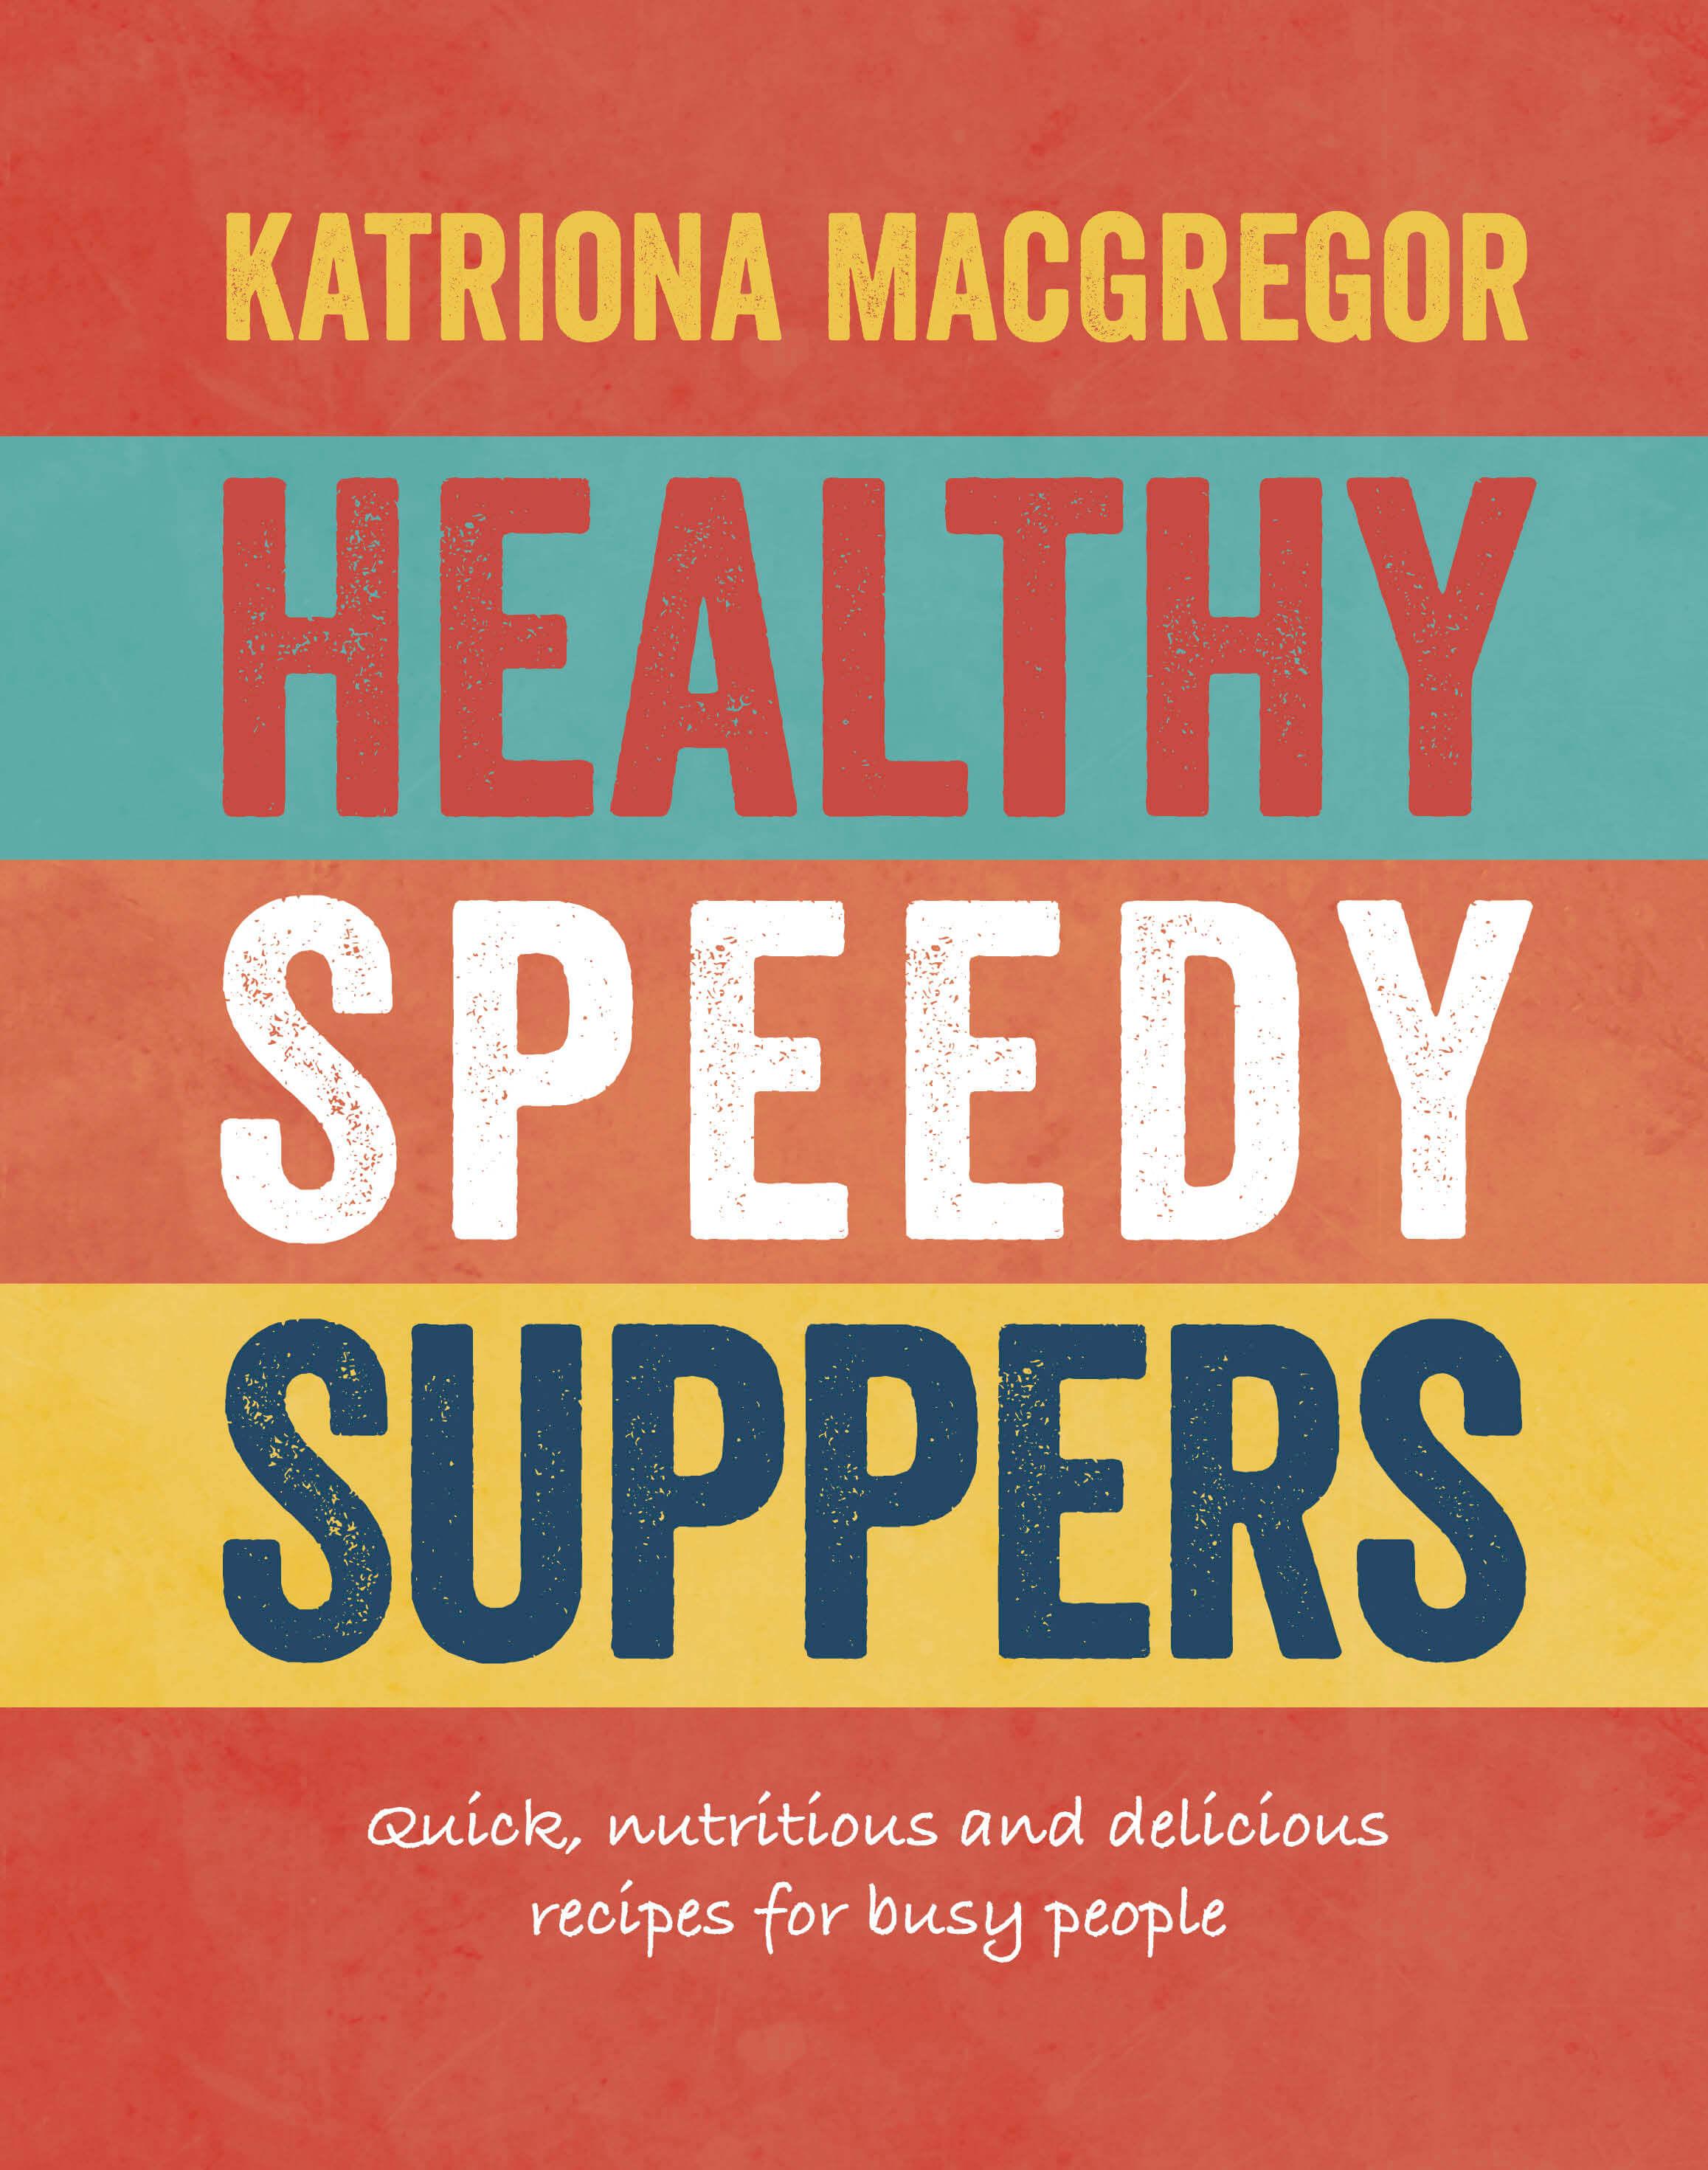 Healthy speedy suppers by katriona macgregor nourishbooks forumfinder Gallery